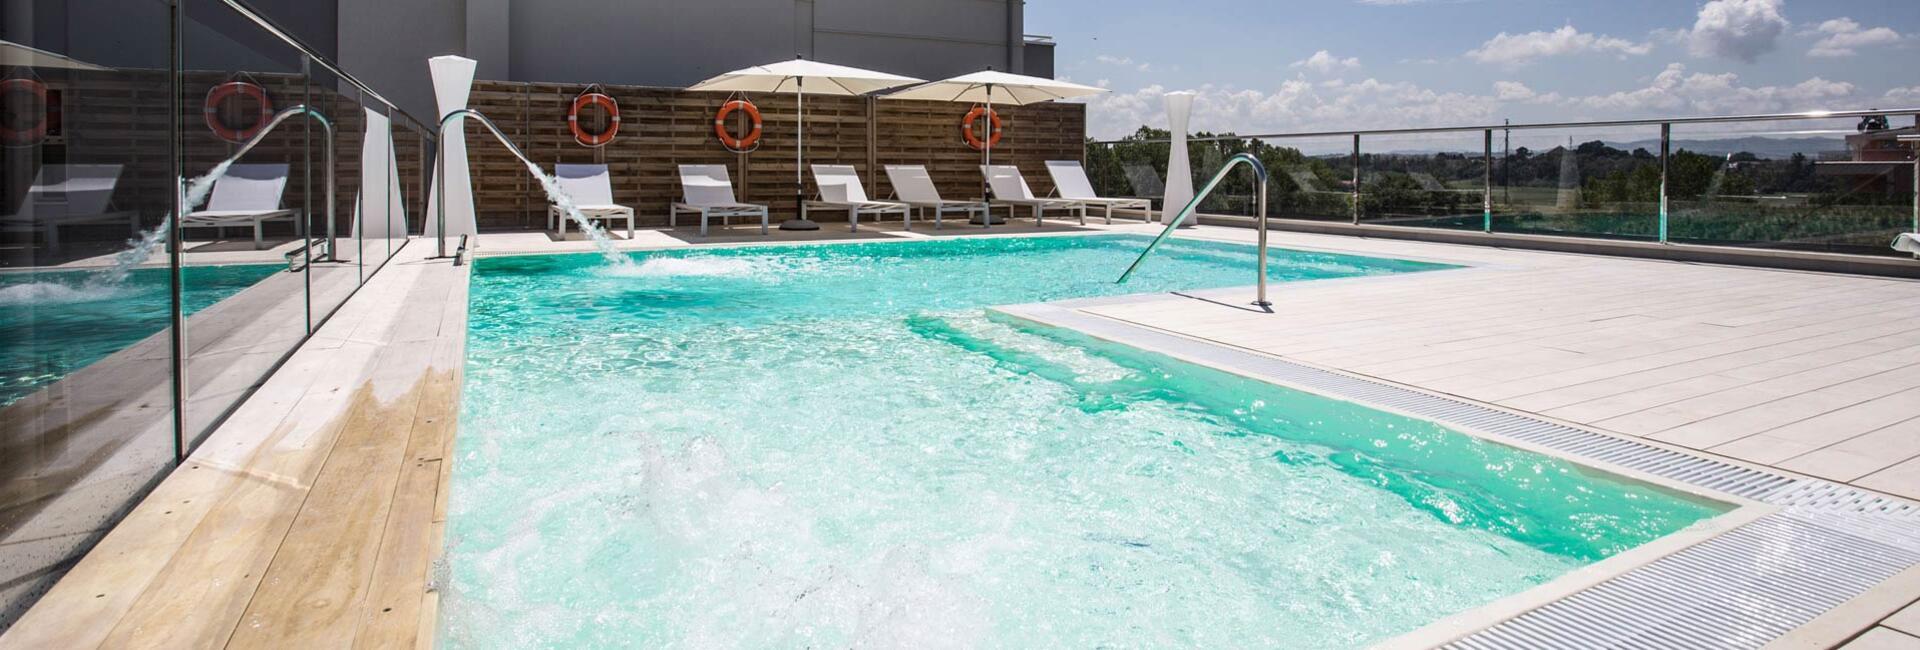 hotelgalamisano en piscina 001